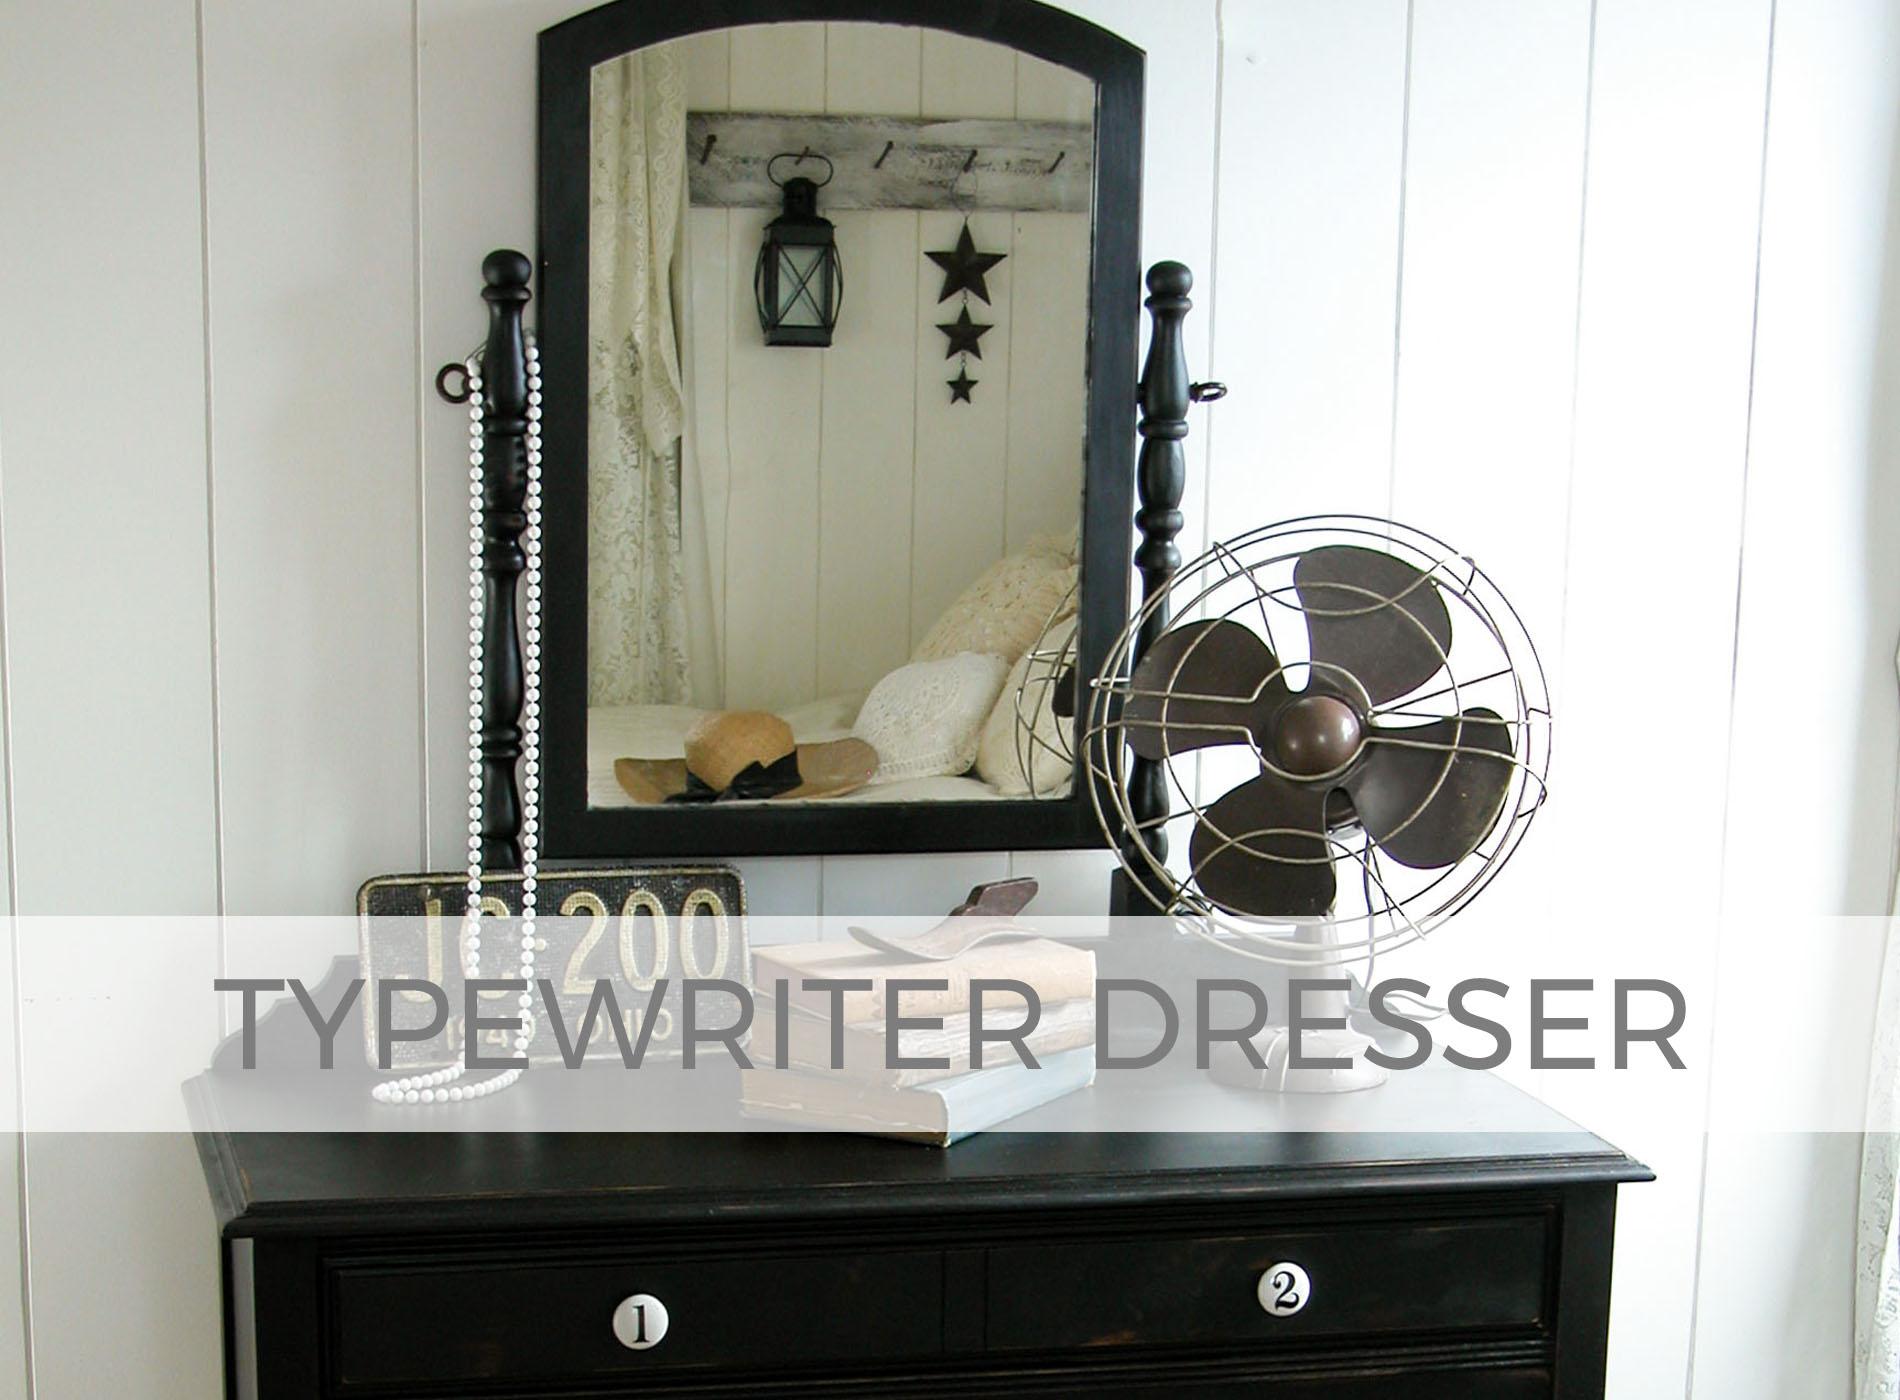 Typewriter Dresser in Black by Larissa of Prodigal Pieces | prodigalpieces.com